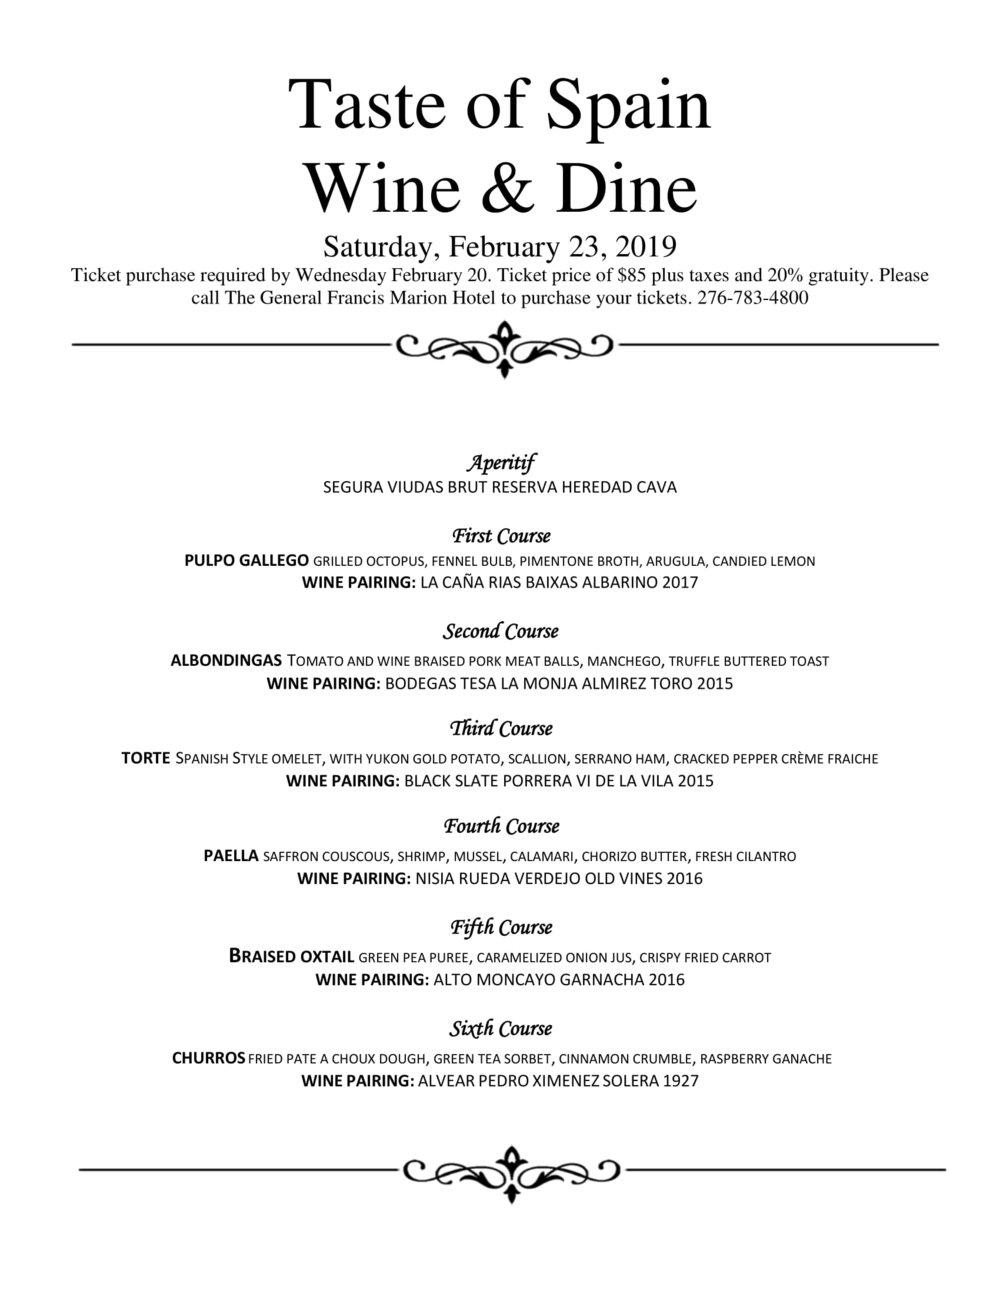 Spain Wine and Dine Food and Wine-1.jpg